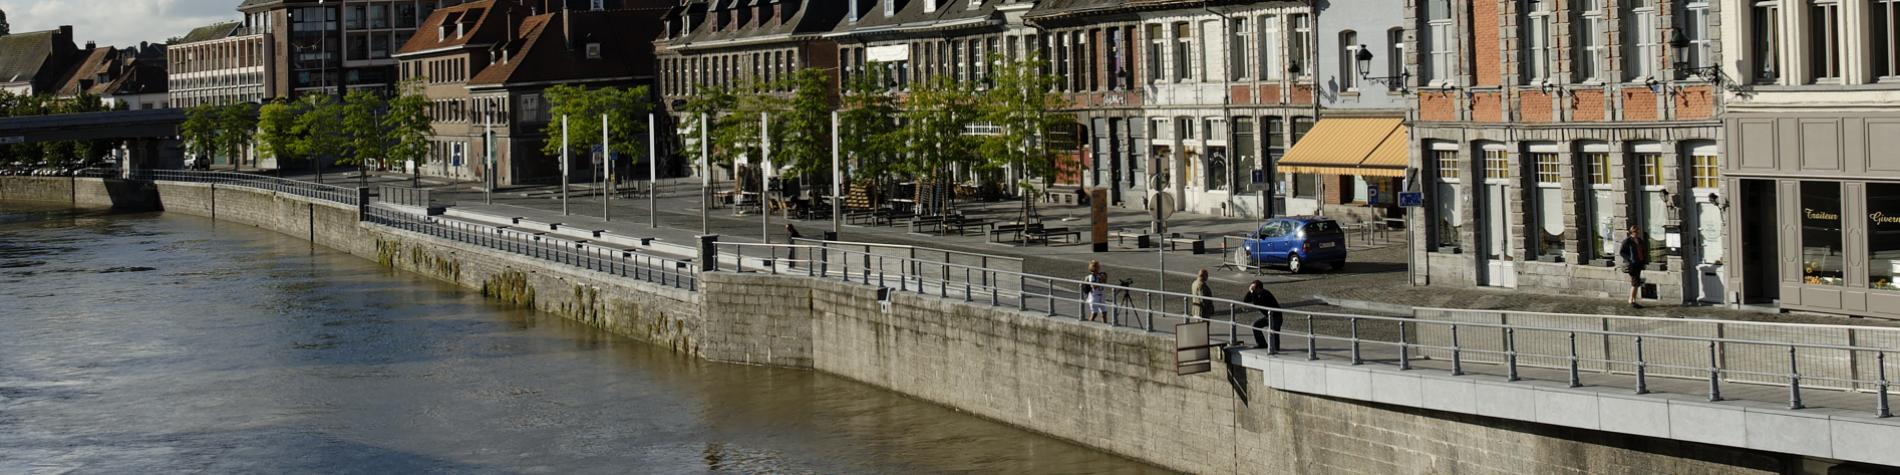 Bord de l'Escaut - Tournai